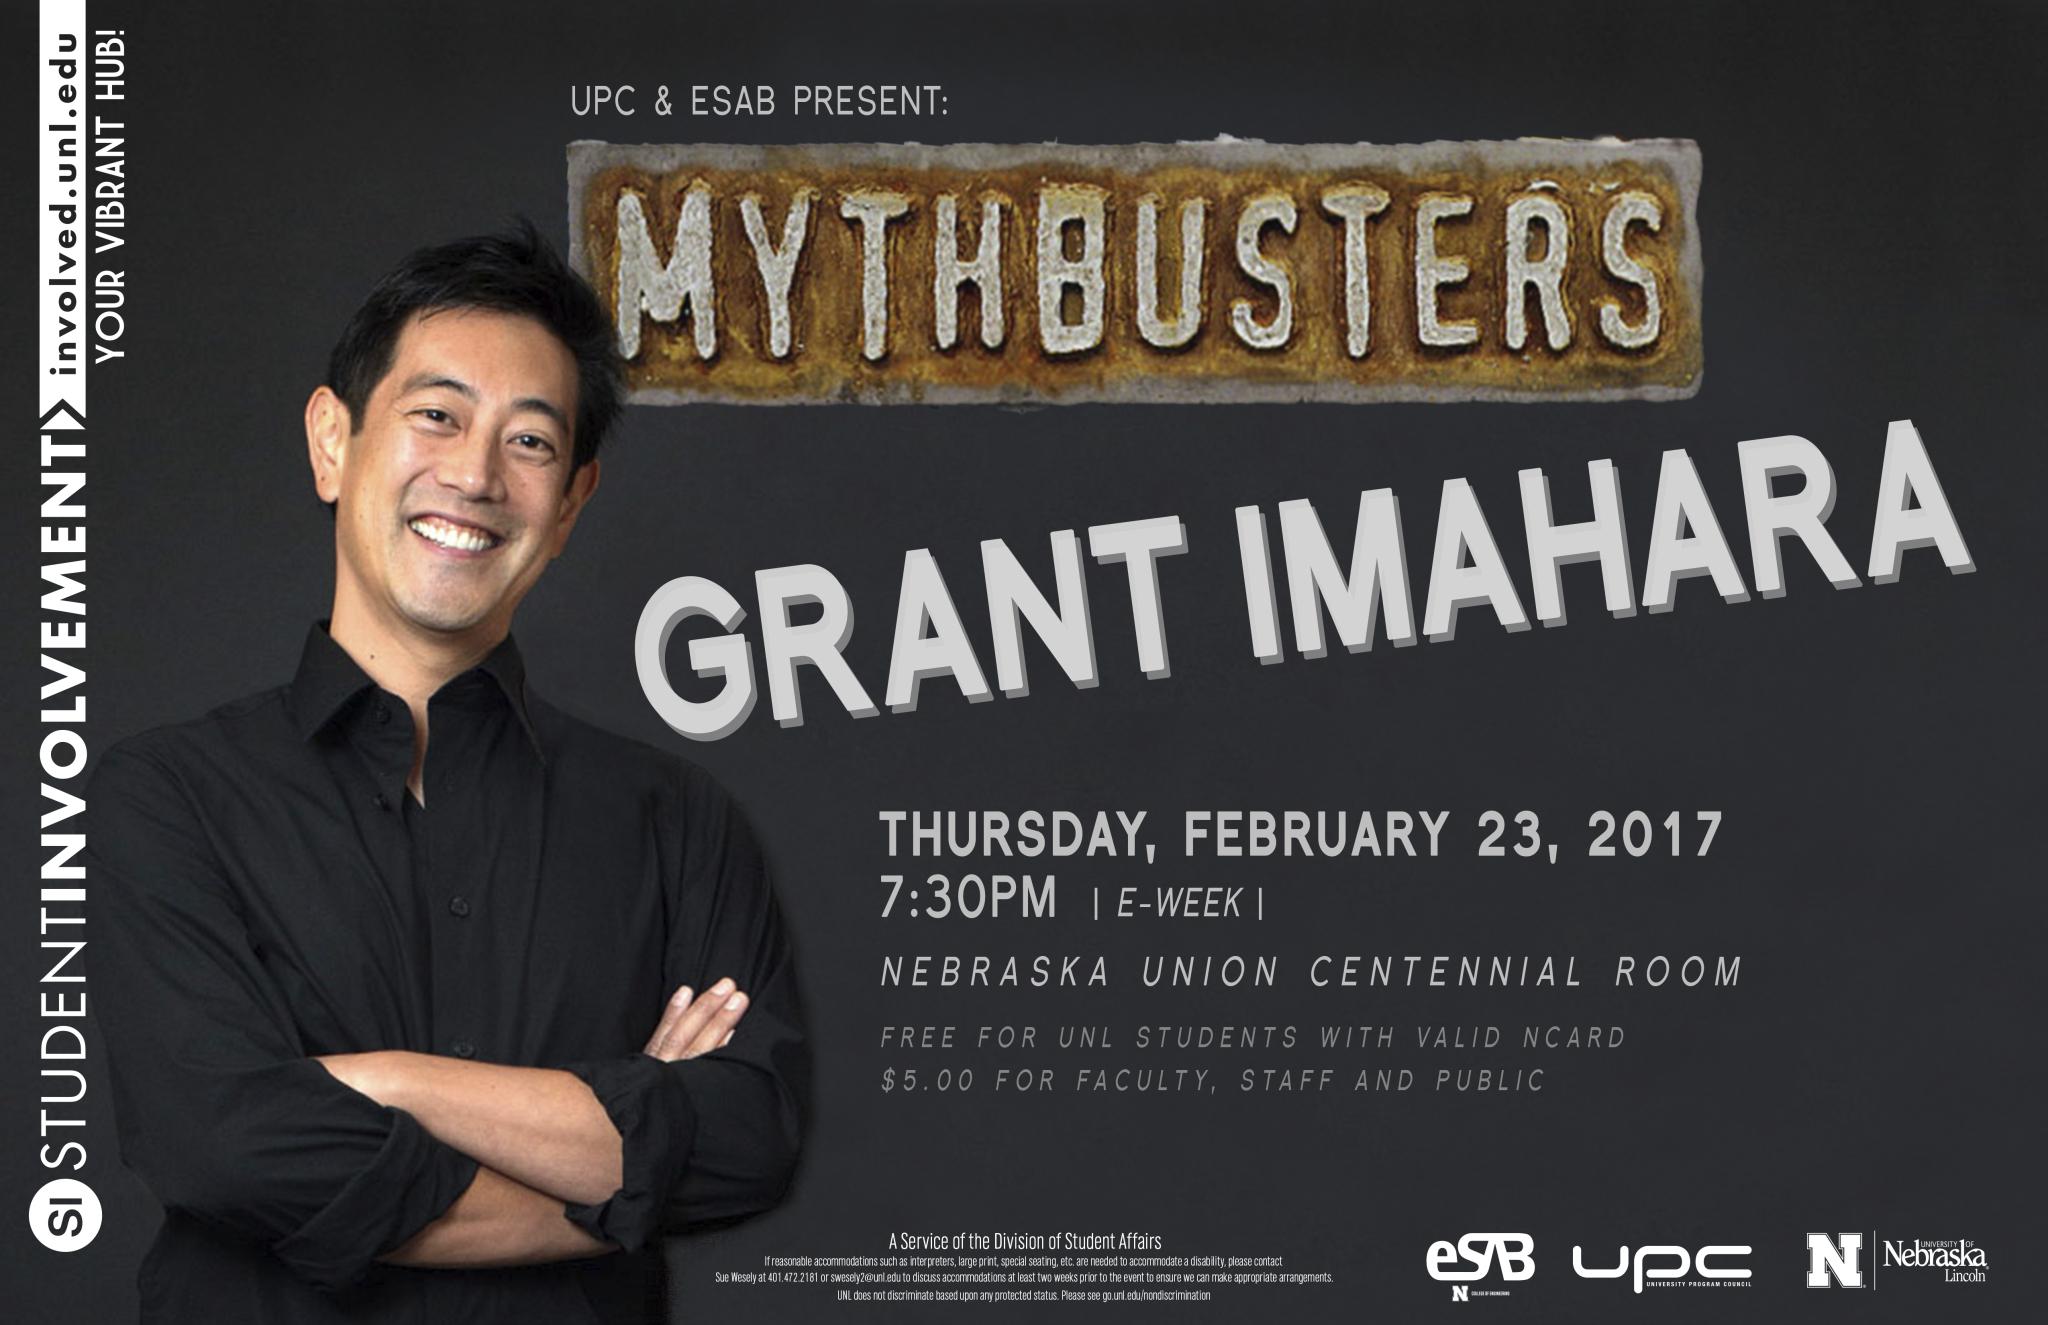 UPC and eSAB Present Grant Imahara